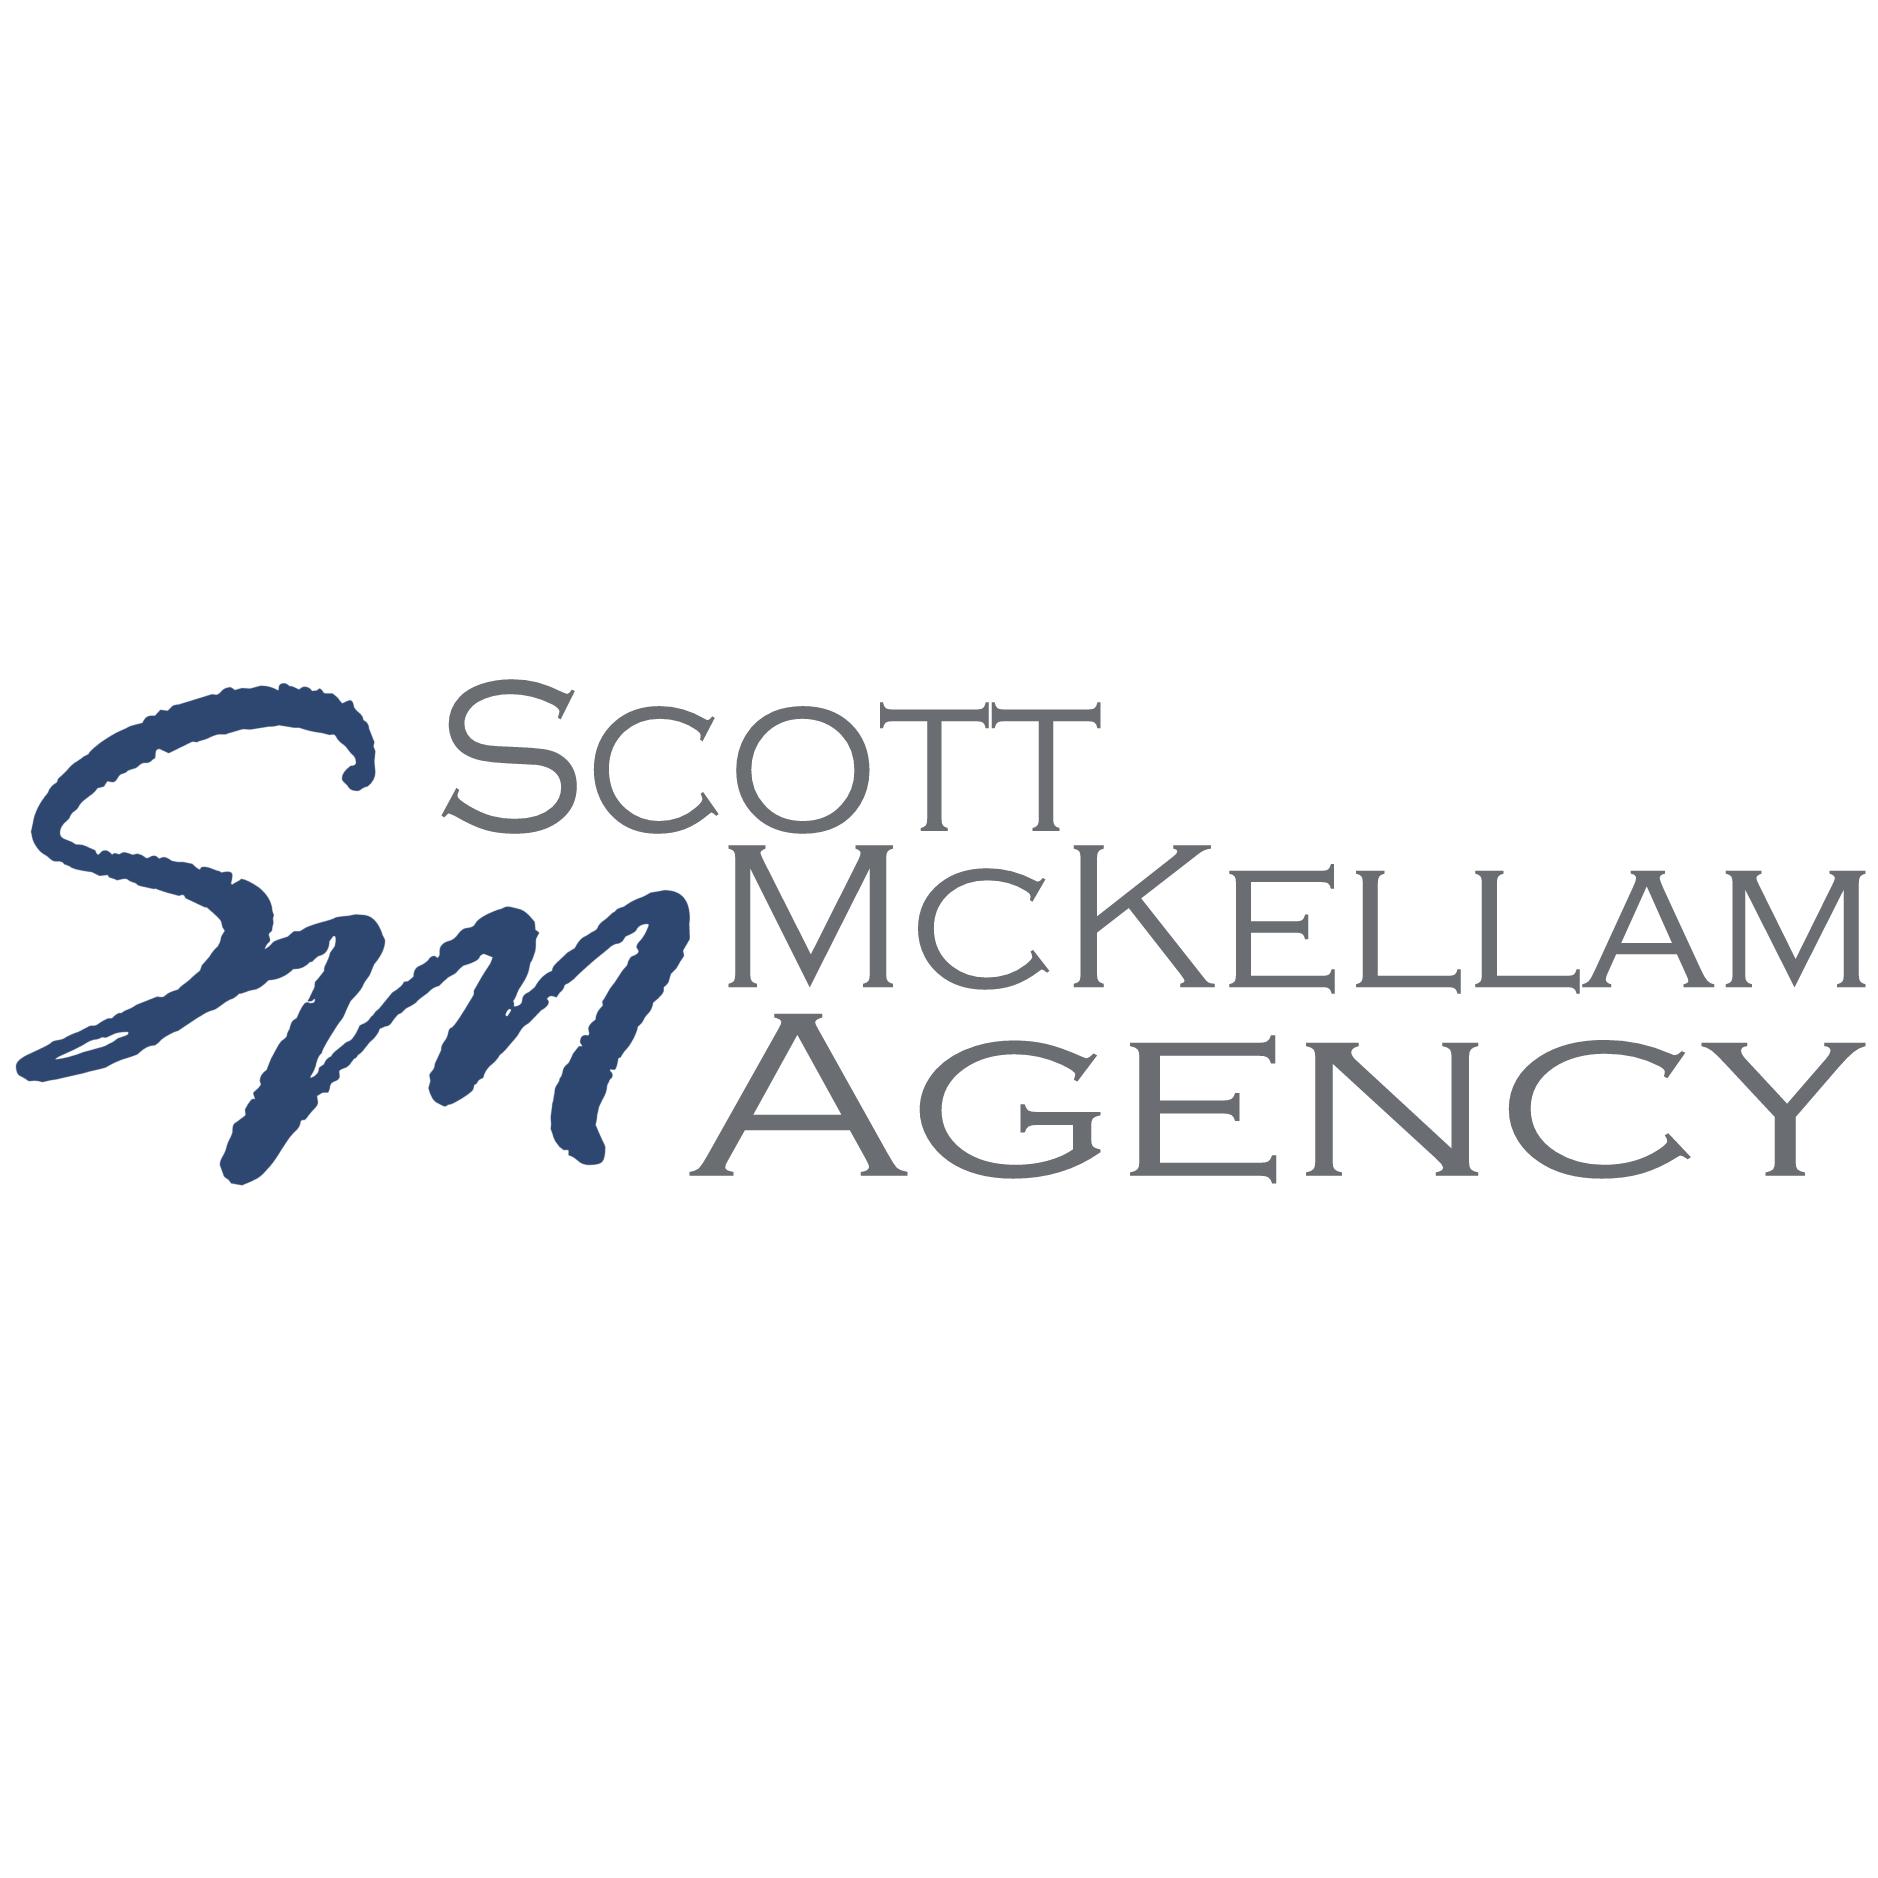 Scott McKellam Agency